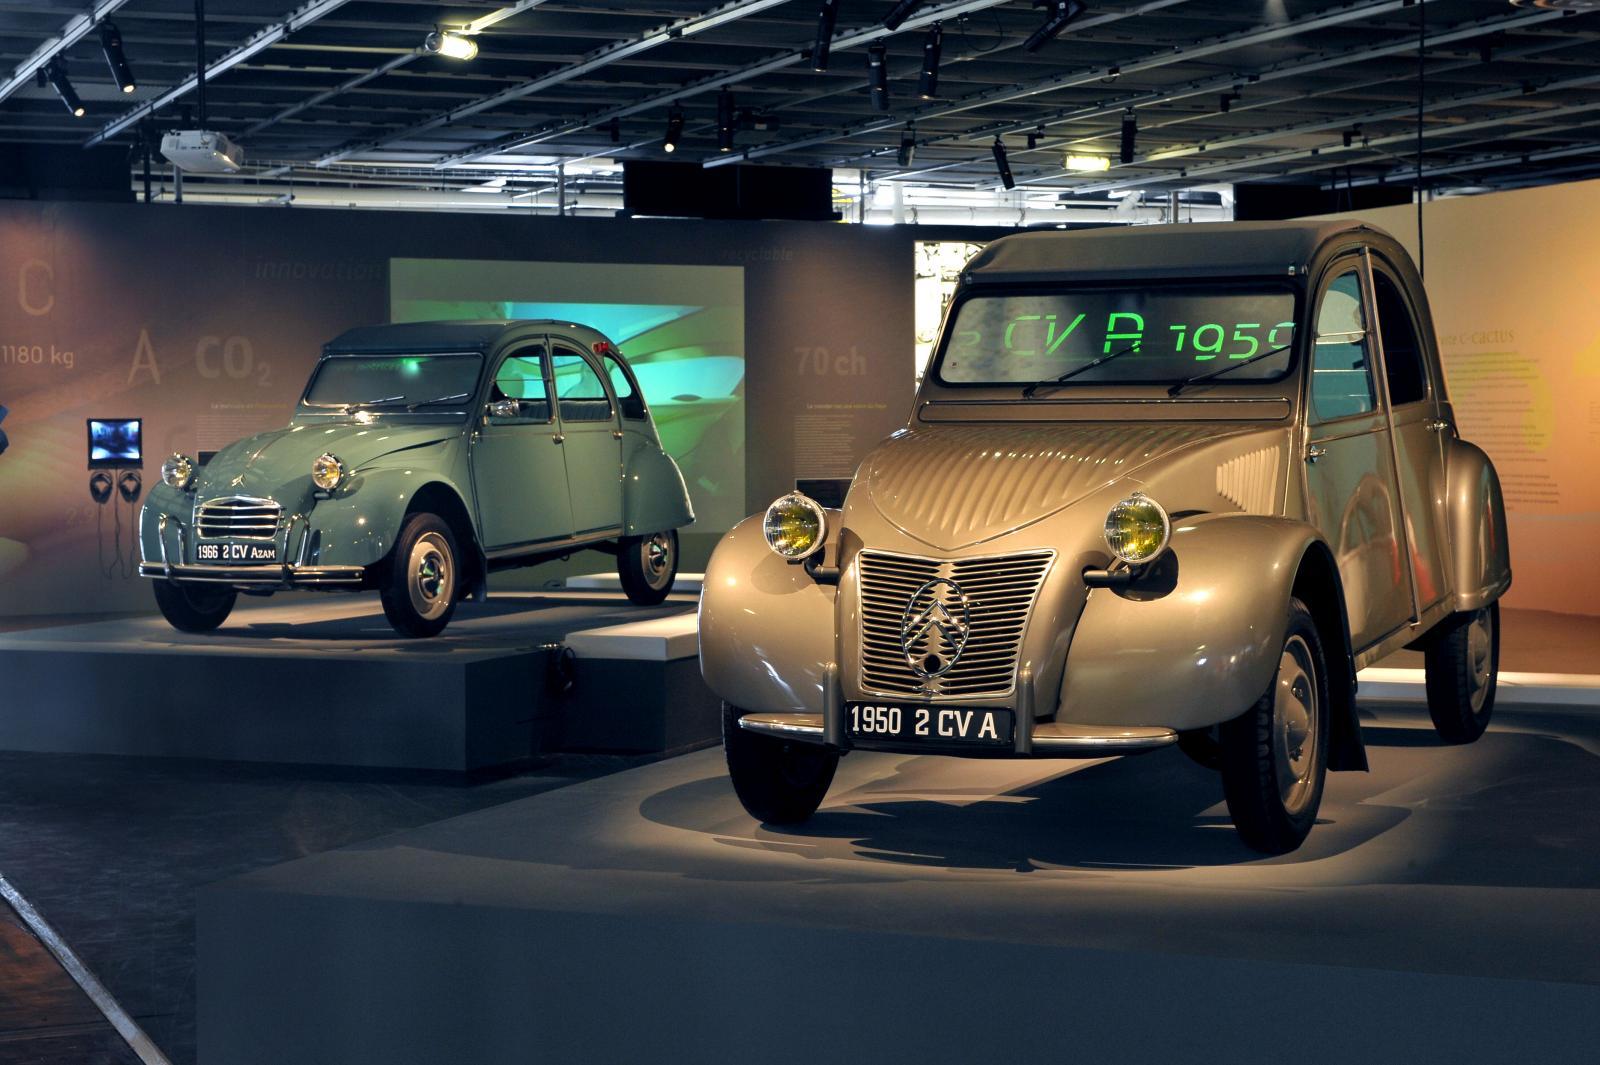 2CV A 1950 et 2CV AZAM 1966